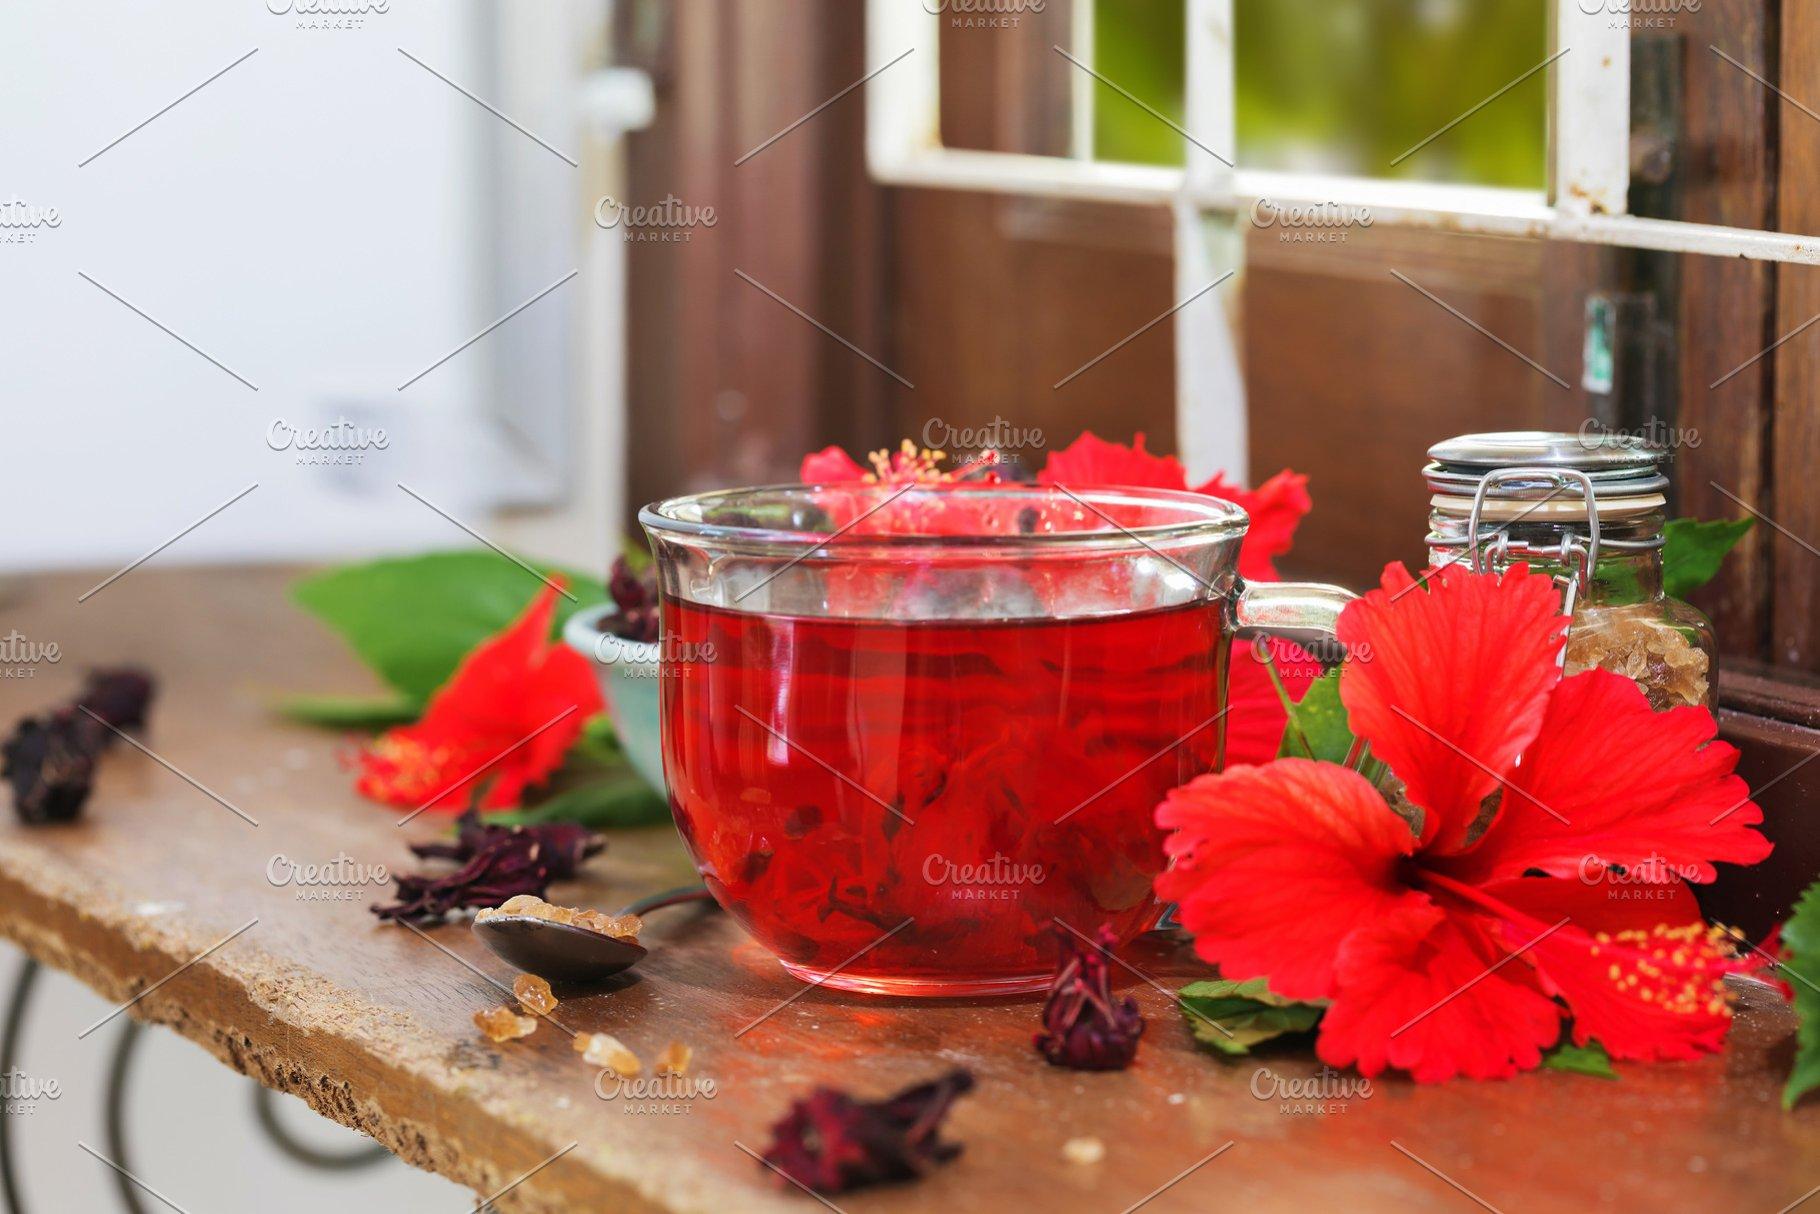 Red Karkade Hibiscus Red Sorrel Tea Food Drink Photos Creative